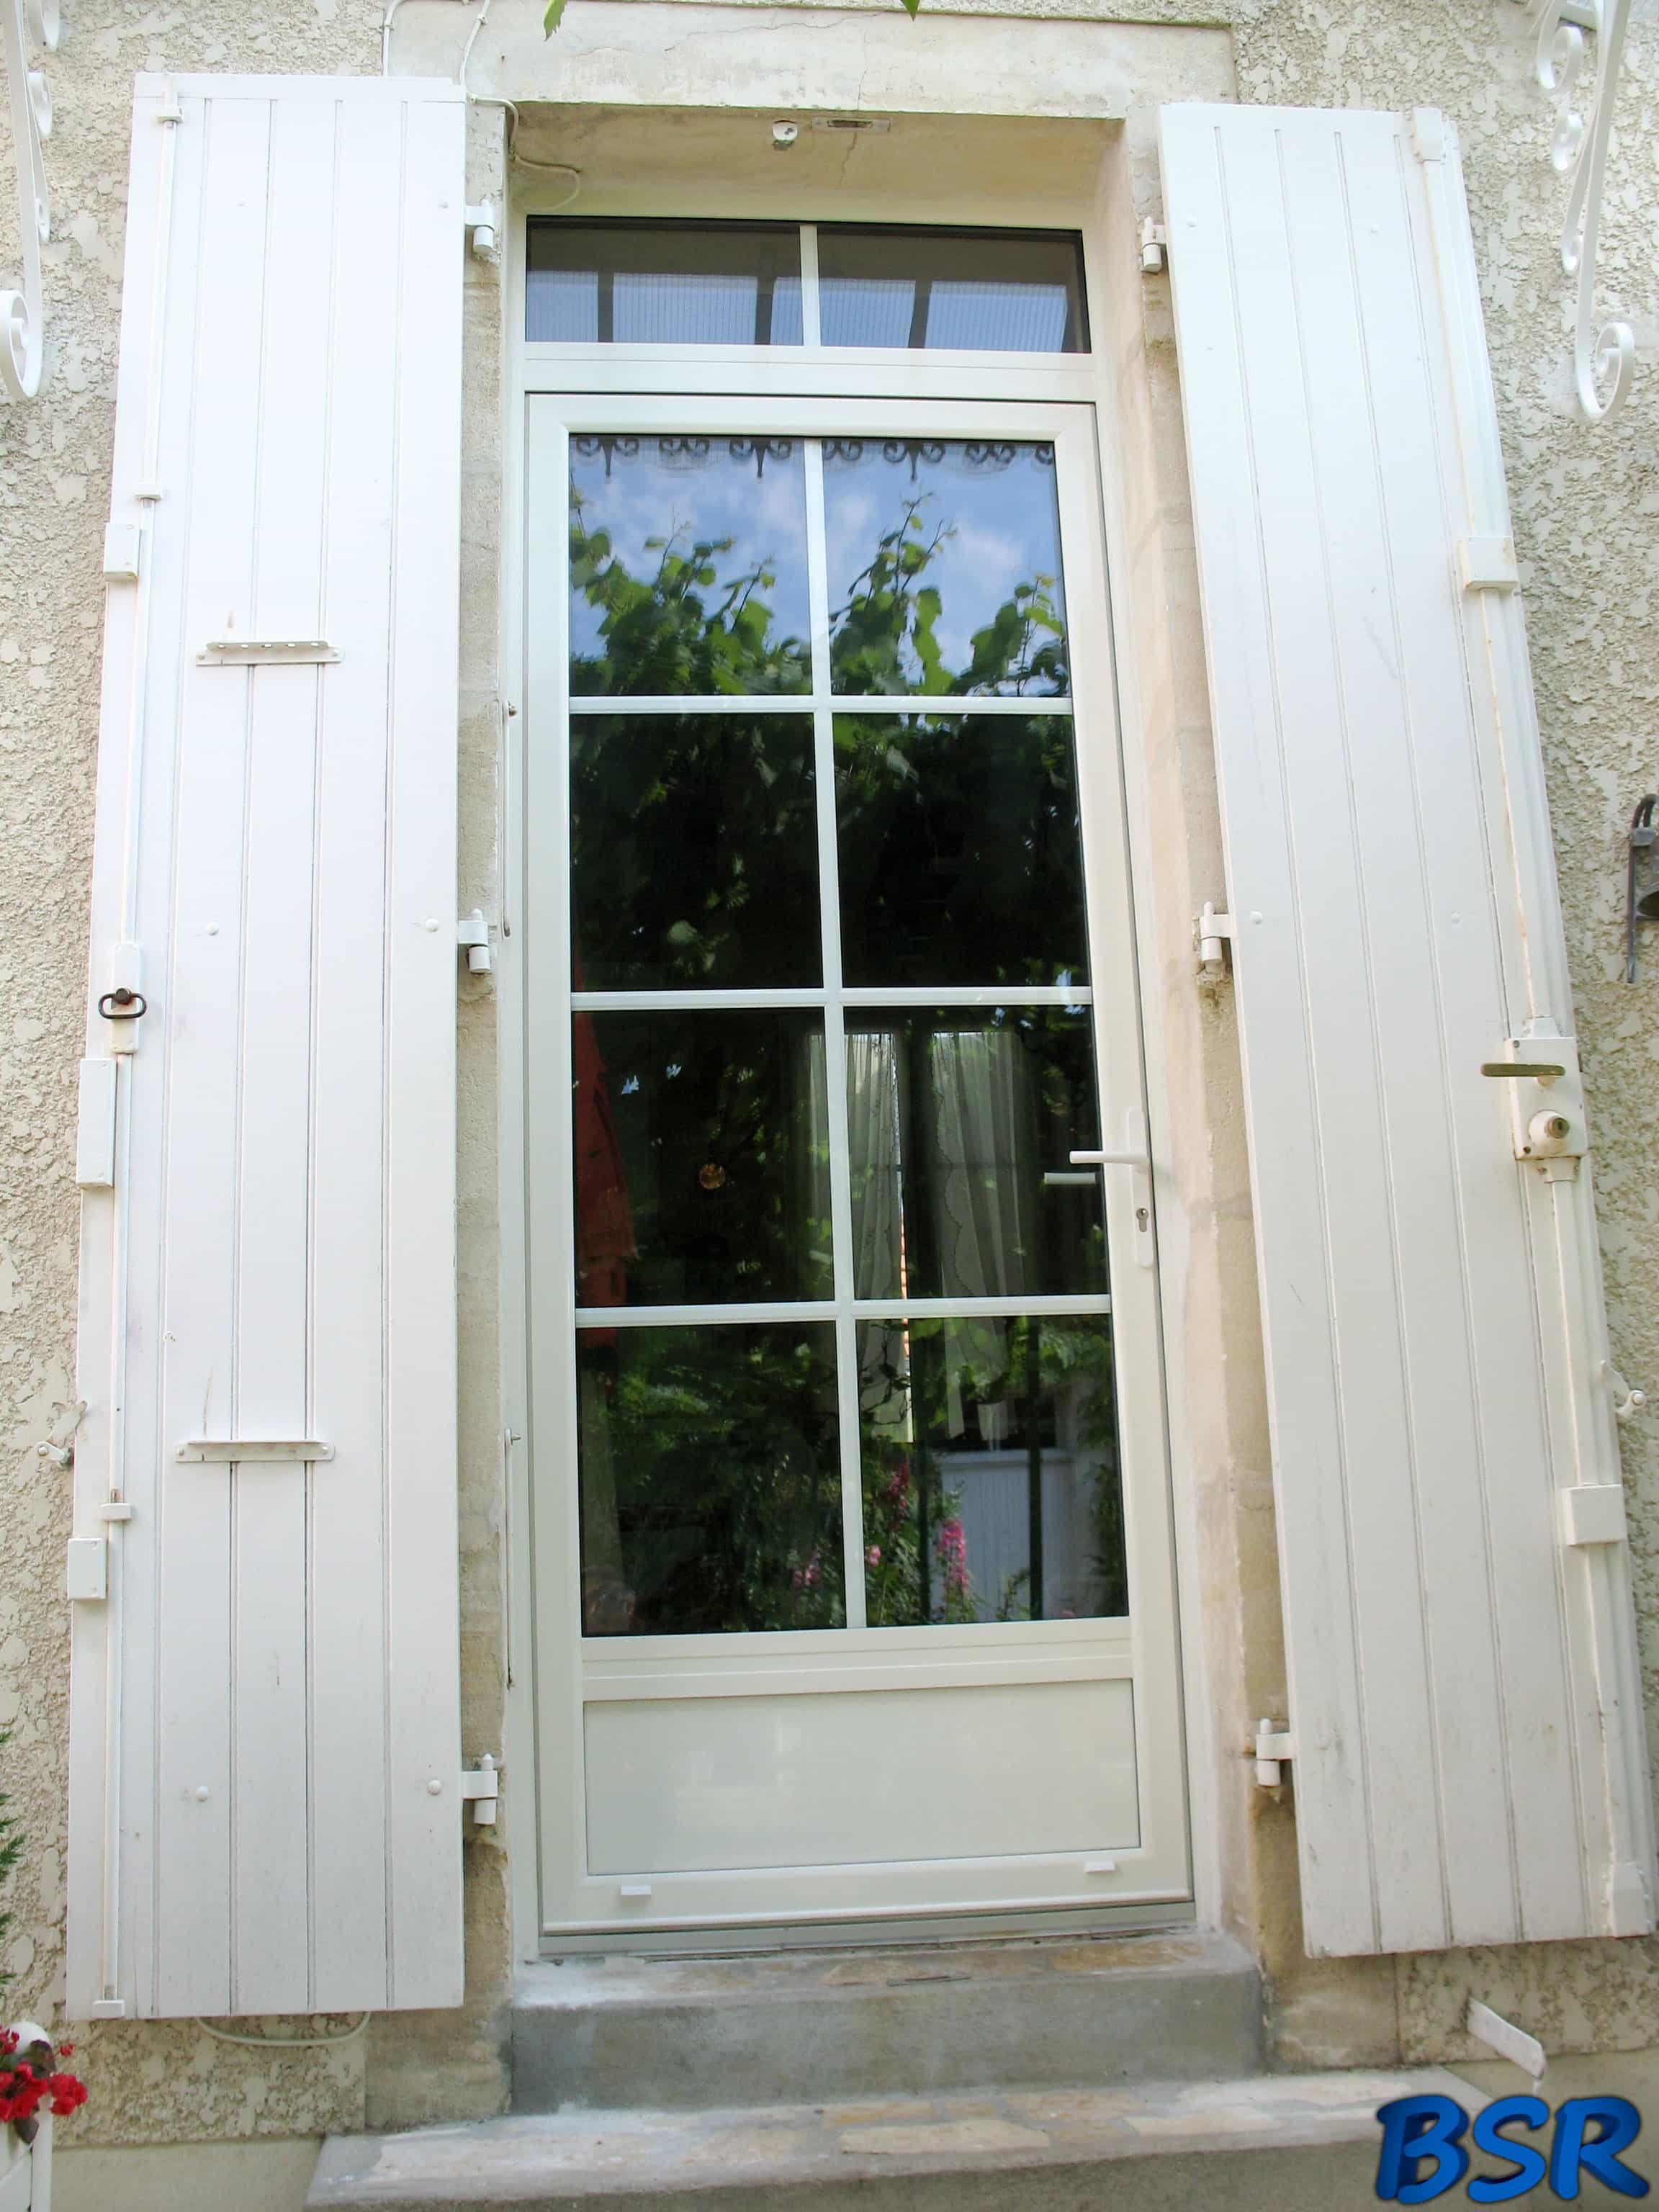 Porte et fenêtre Aluminium BSR 008